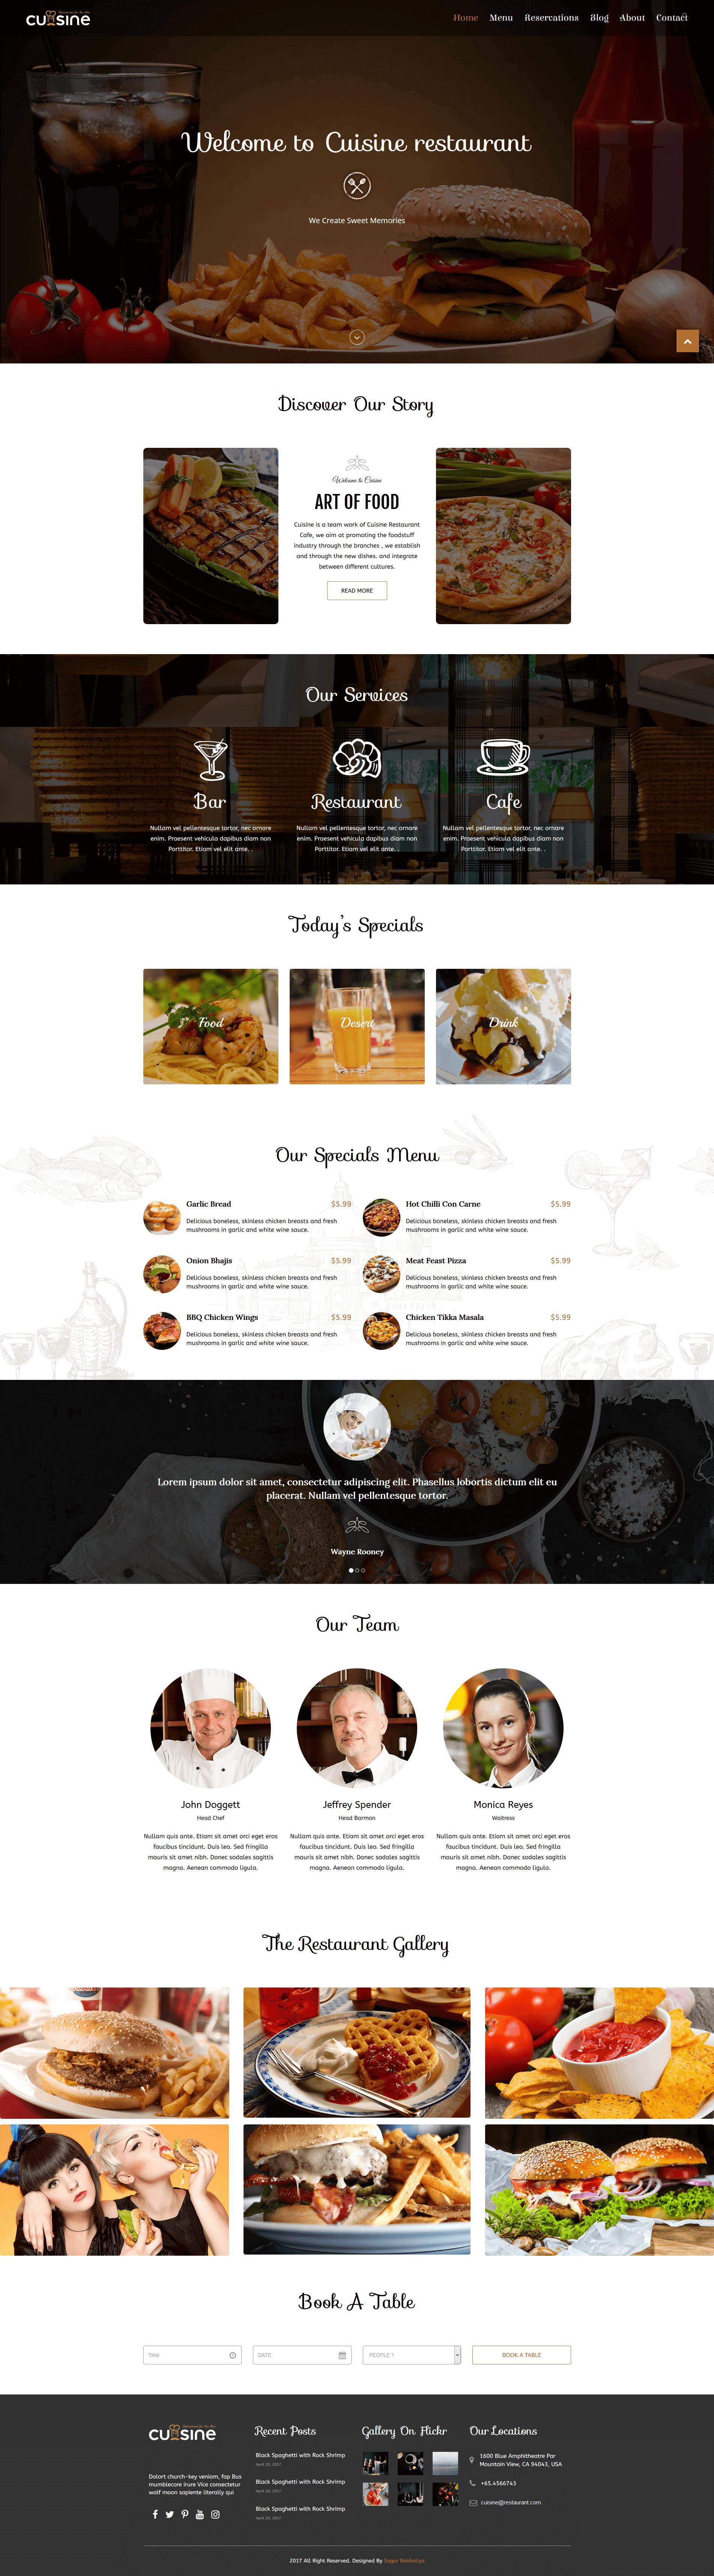 Cuisine - Responsive Restaurant HTML Template by sagarMR   ThemeForest